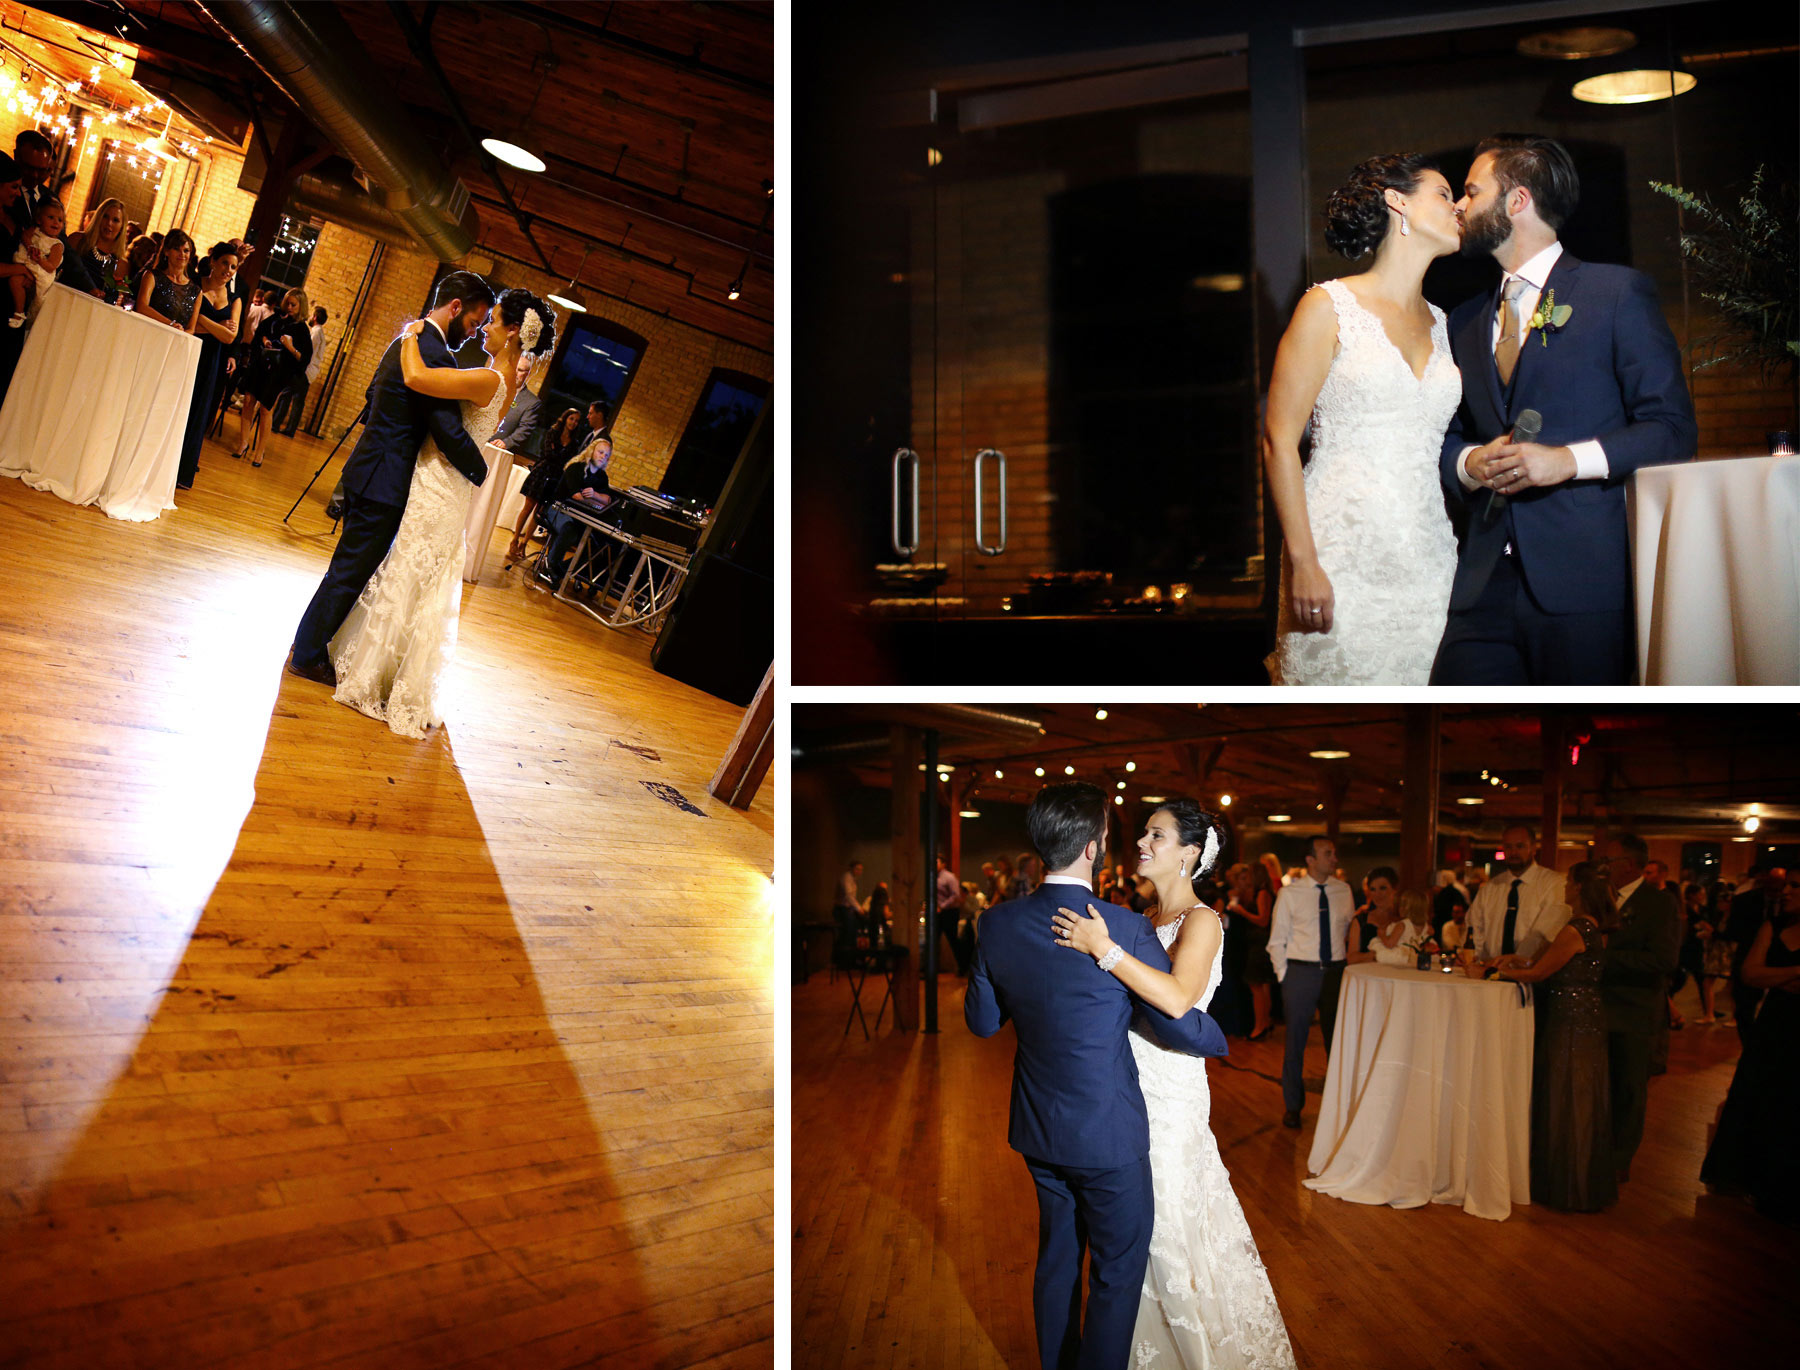 25-Minneapolis-Minnesota-Wedding-Photographer-by-Andrew-Vick-Photography-Summer-Solar-Arts-Reception-Dance-Kiss-Ashley-and-Eric.jpg